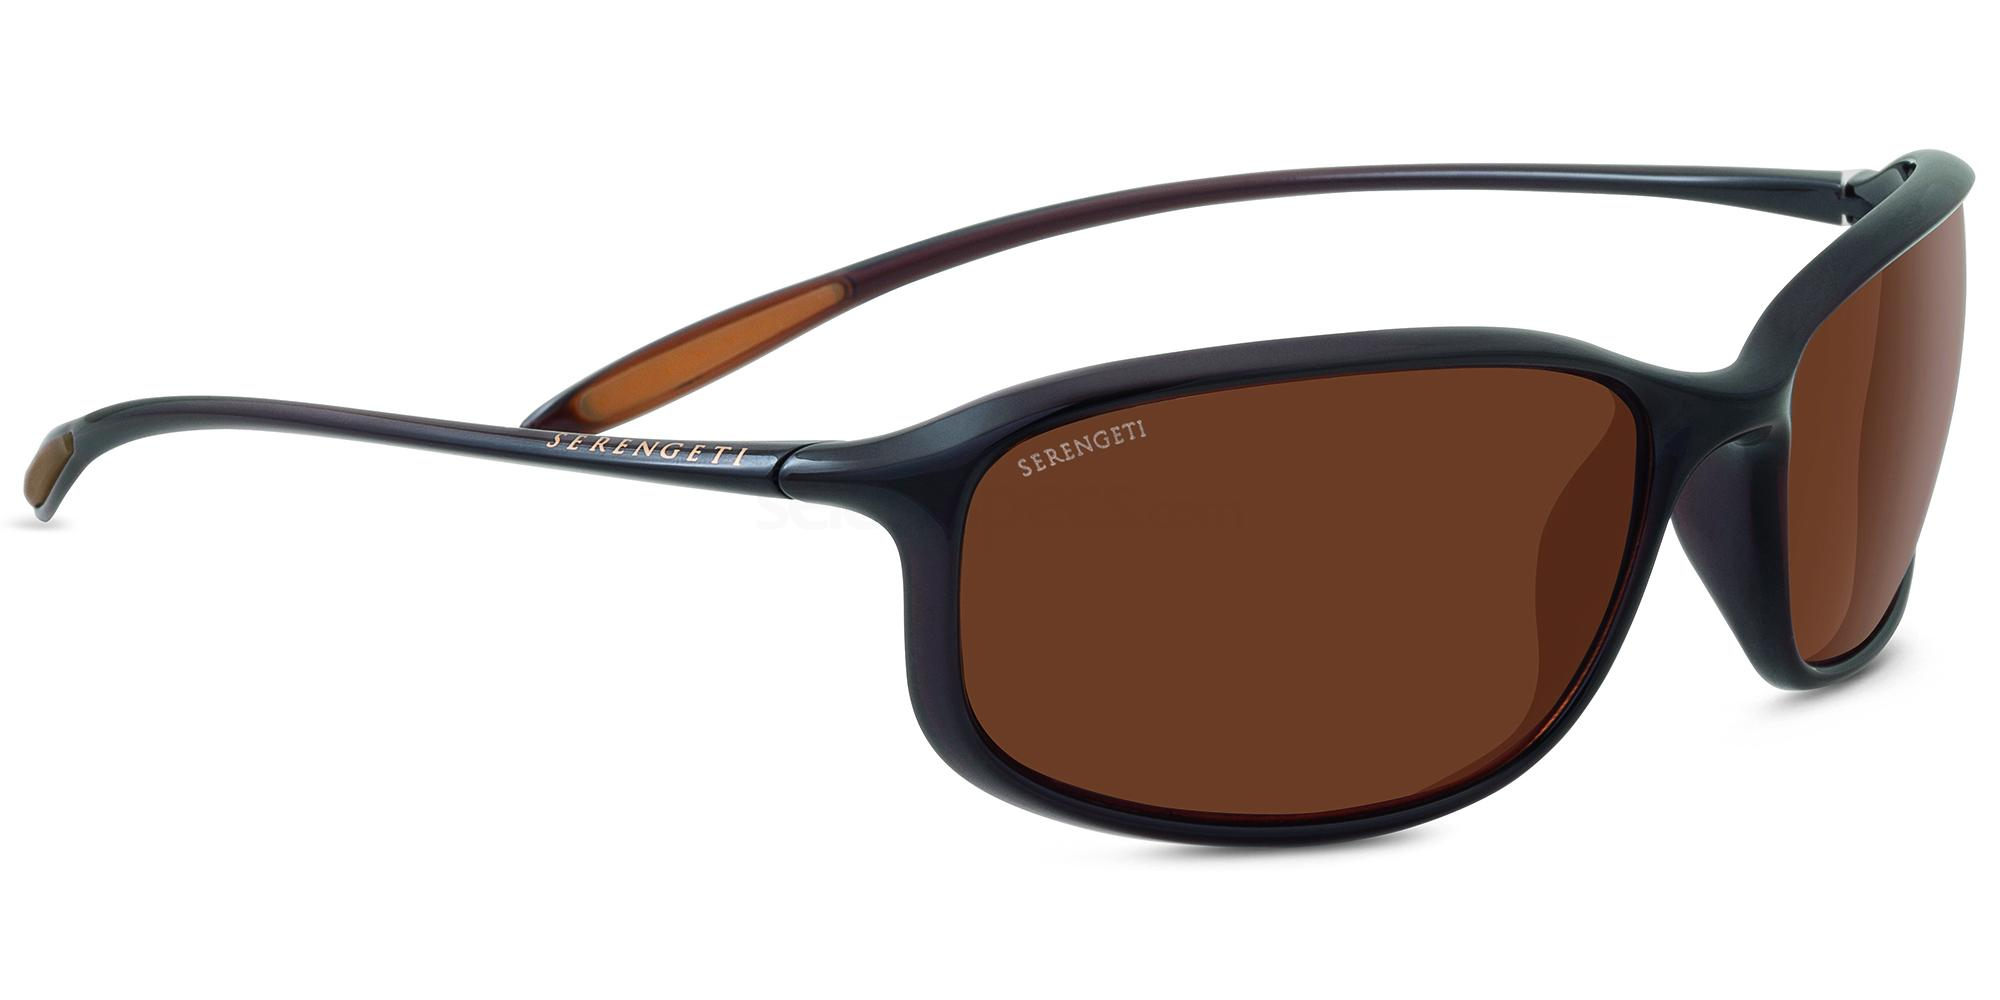 8109 Serengeti SESTRIERE Sunglasses, Serengeti